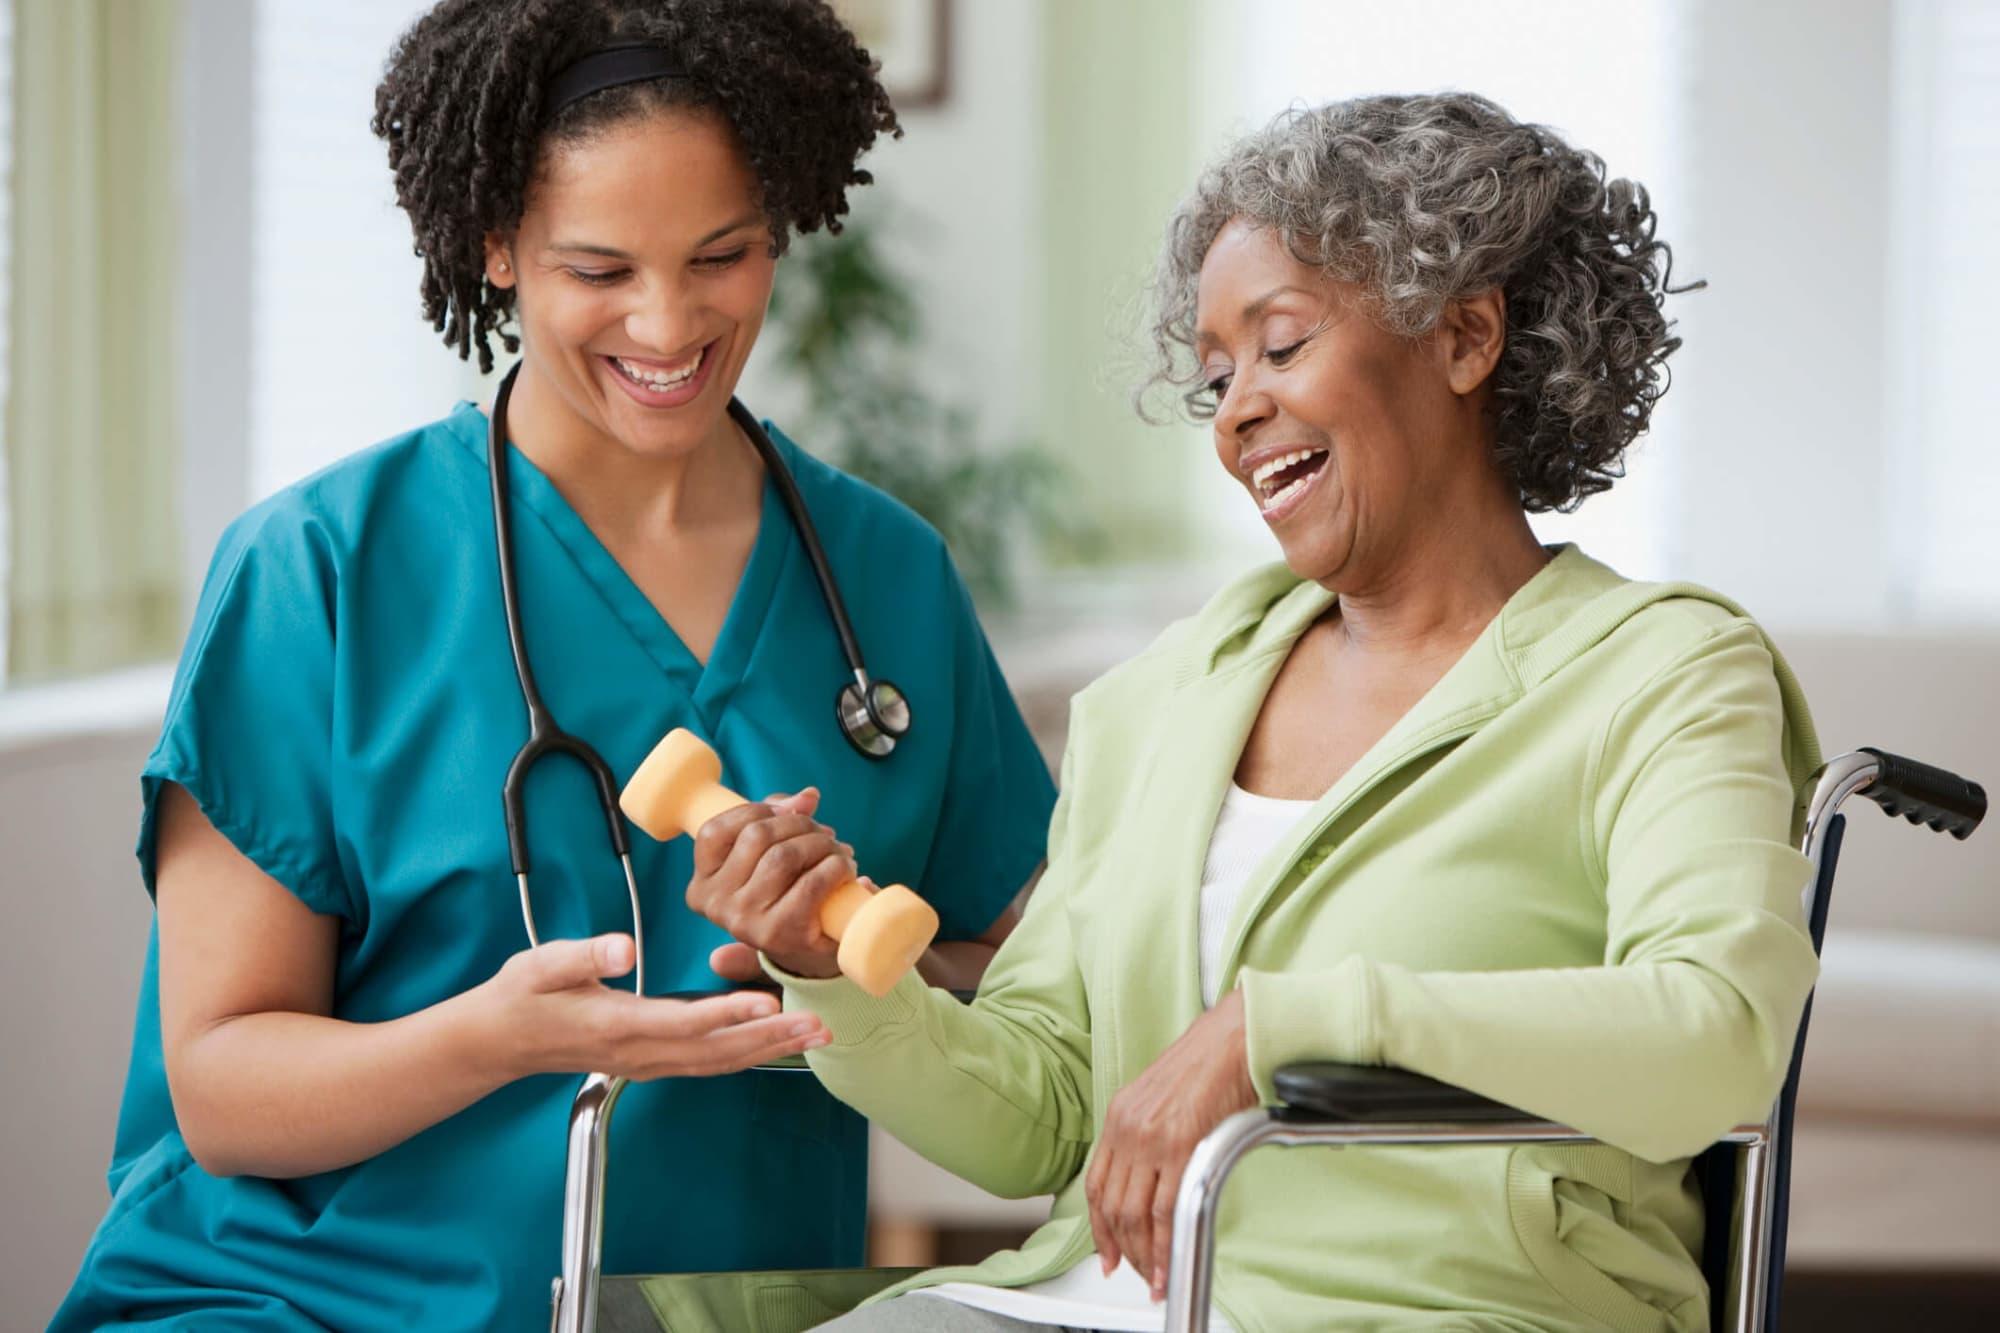 Where Do Nurses Work? A Breakdown of the Various Job Settings for Nurses